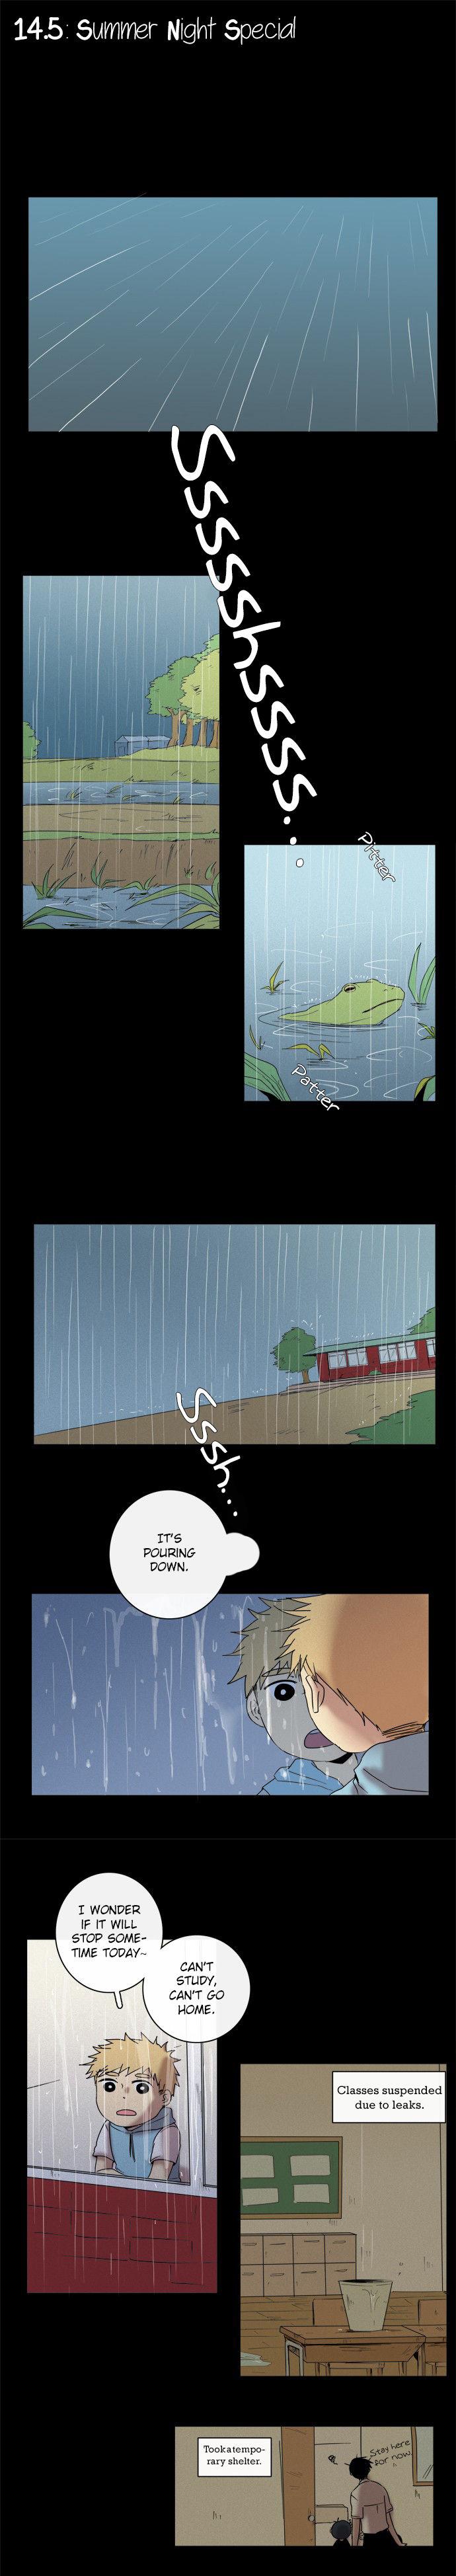 The Children's Teacher, Mr. Kwon 14.5 Page 2